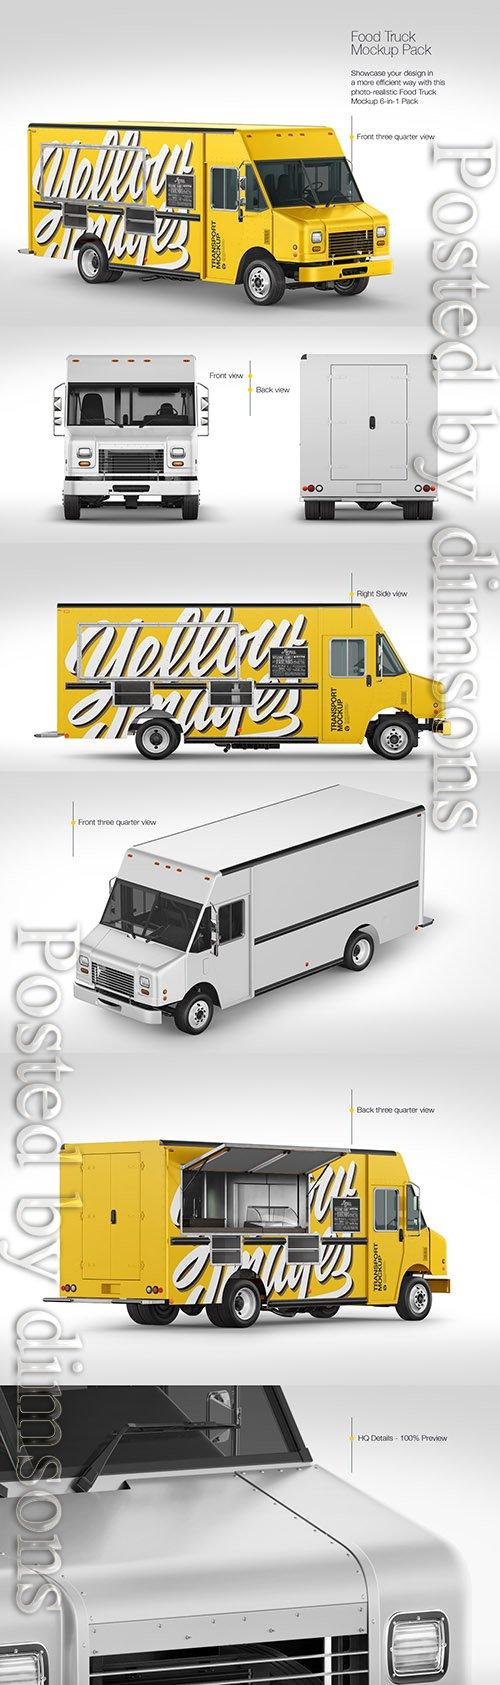 Food Truck Mockup Pack TIF